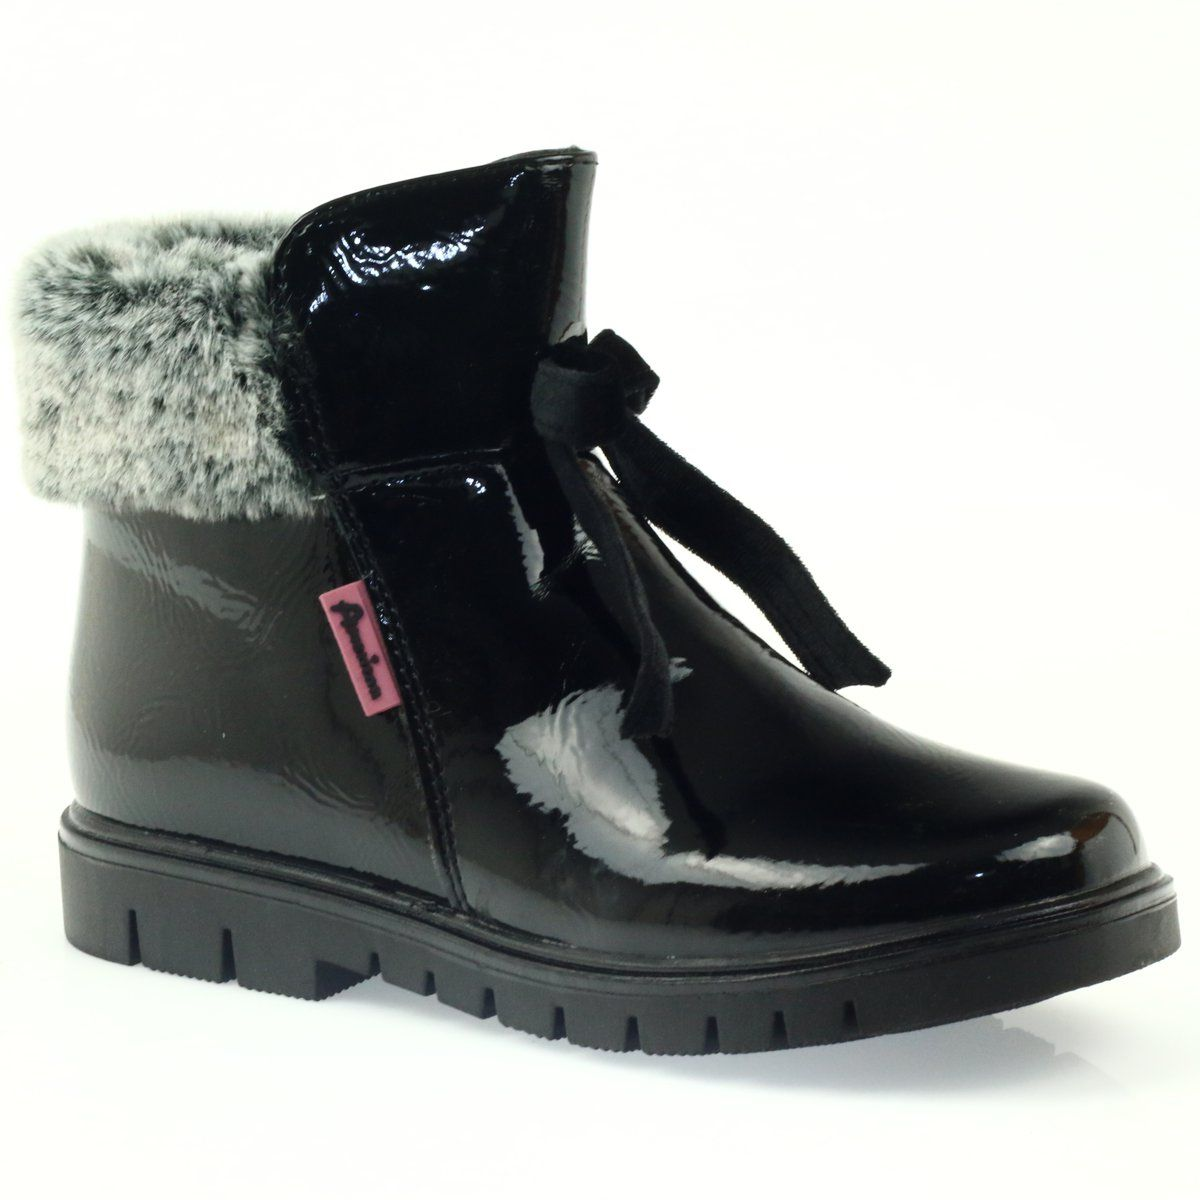 Botki Dla Dzieci Americanclub American Club Czarne Kozaczki Z Futerkiem 18015 Hunter Boots Boots Rain Boots